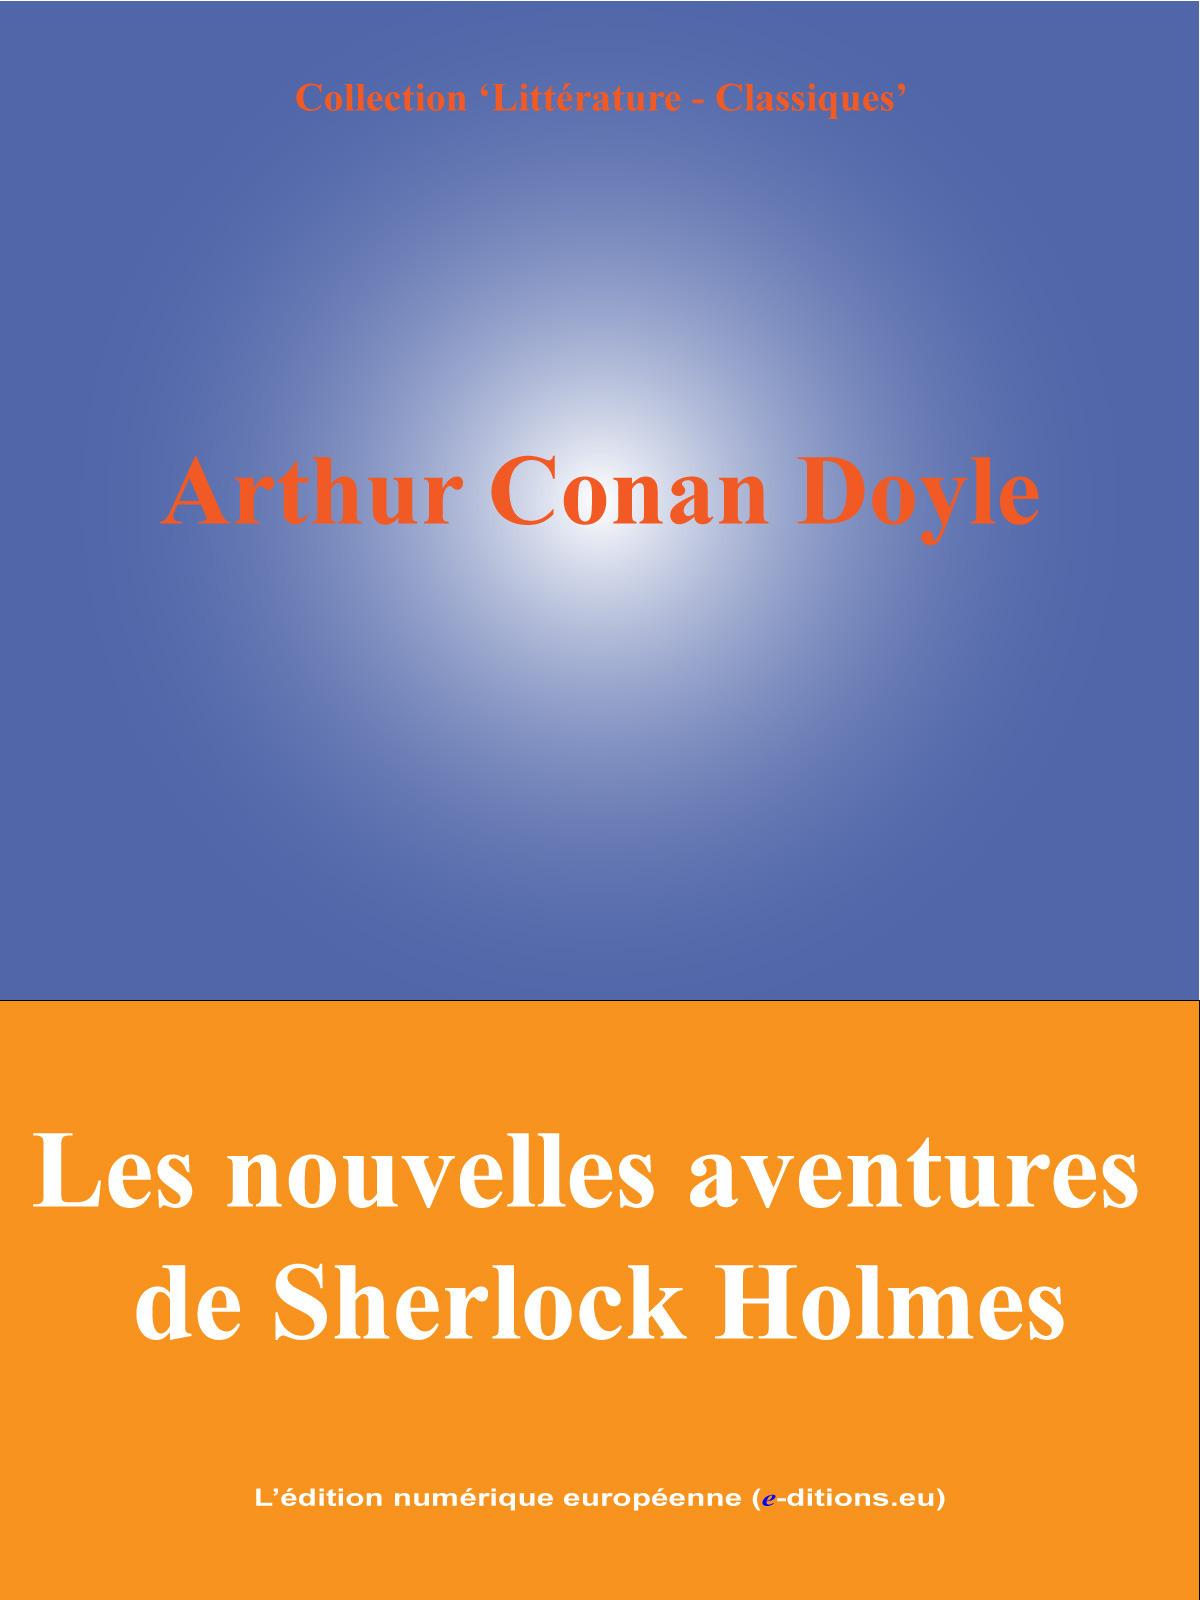 Les nouvelles aventures de Sherlock Holmes  - Arthur CONAN DOYLE